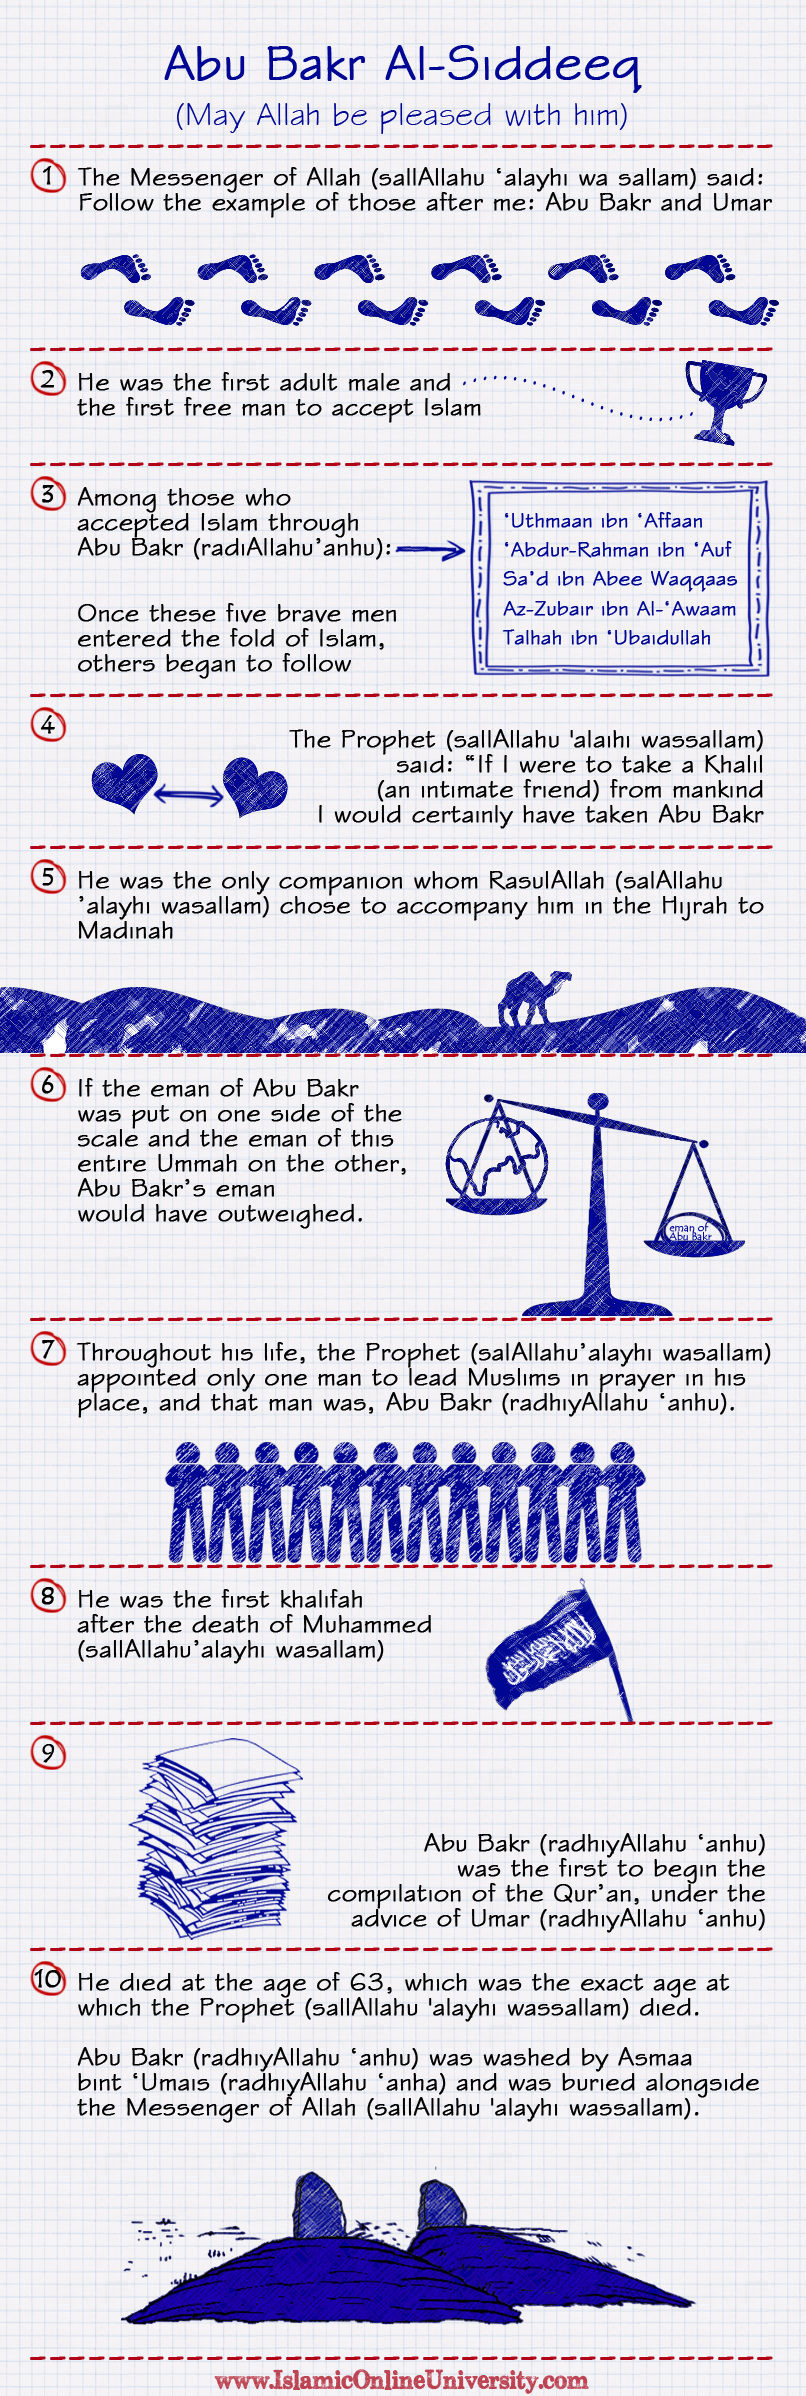 Abu-Bakr_inforgraphic